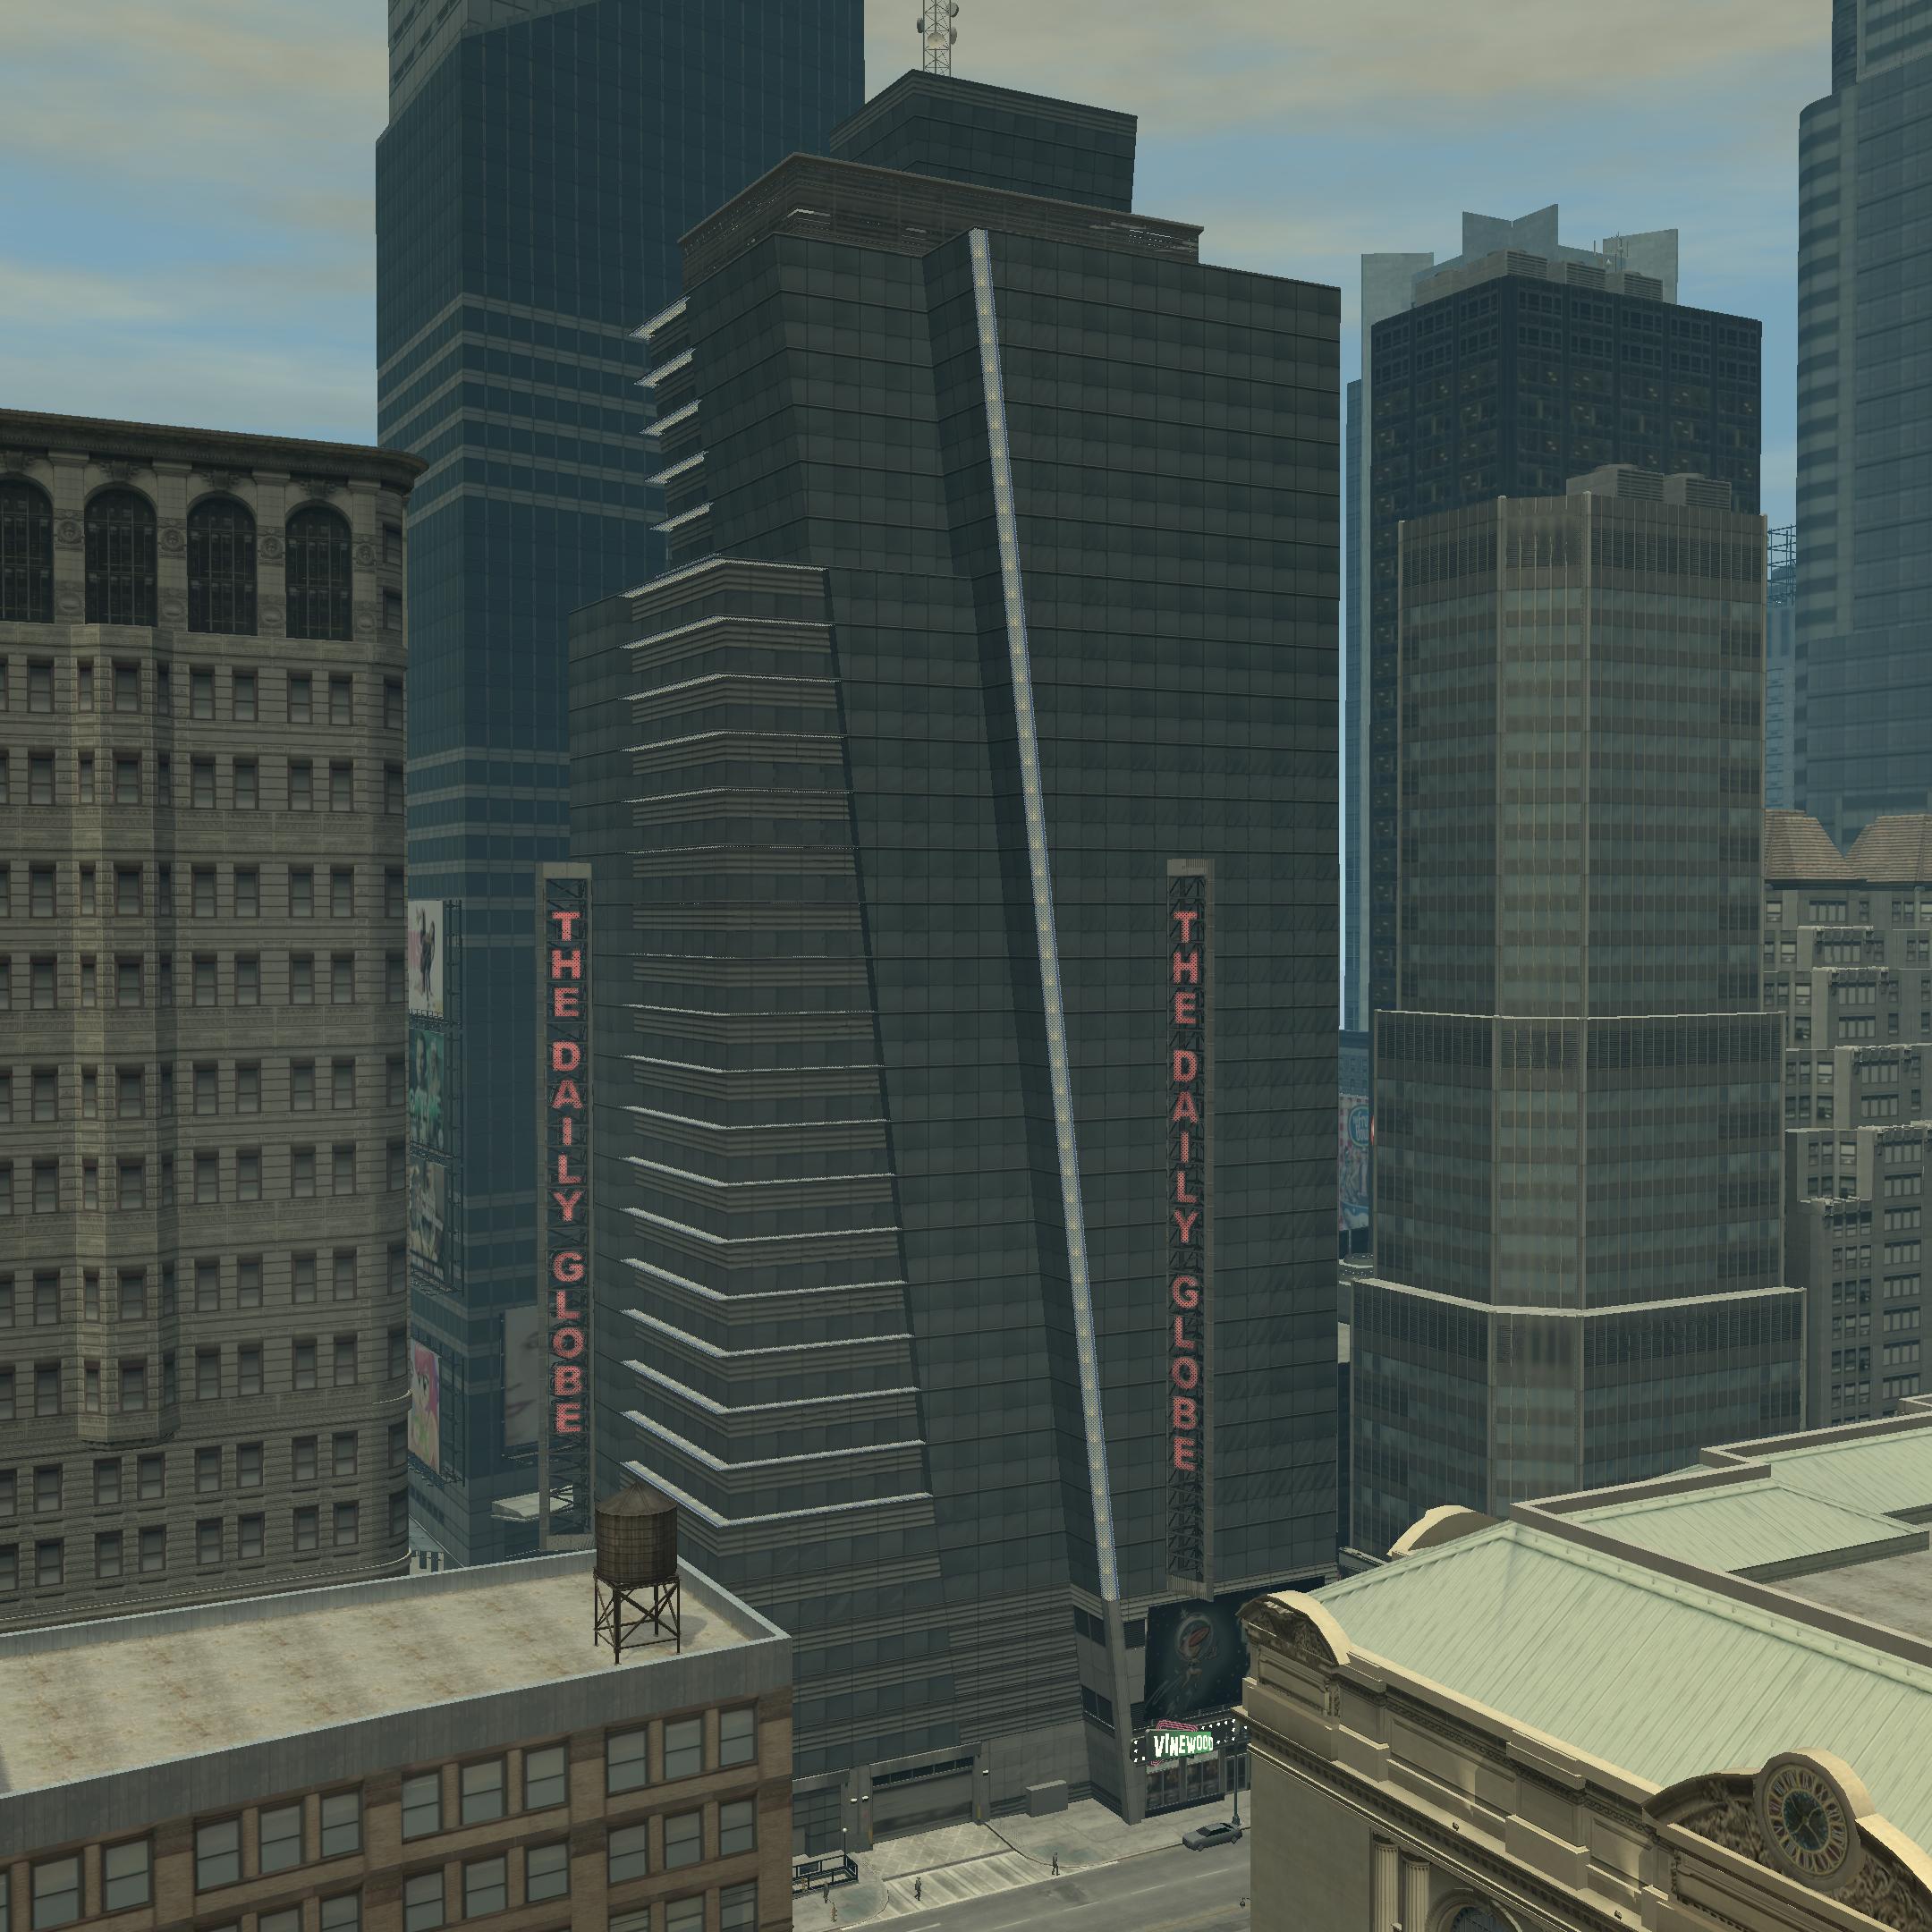 Daily Globe Building